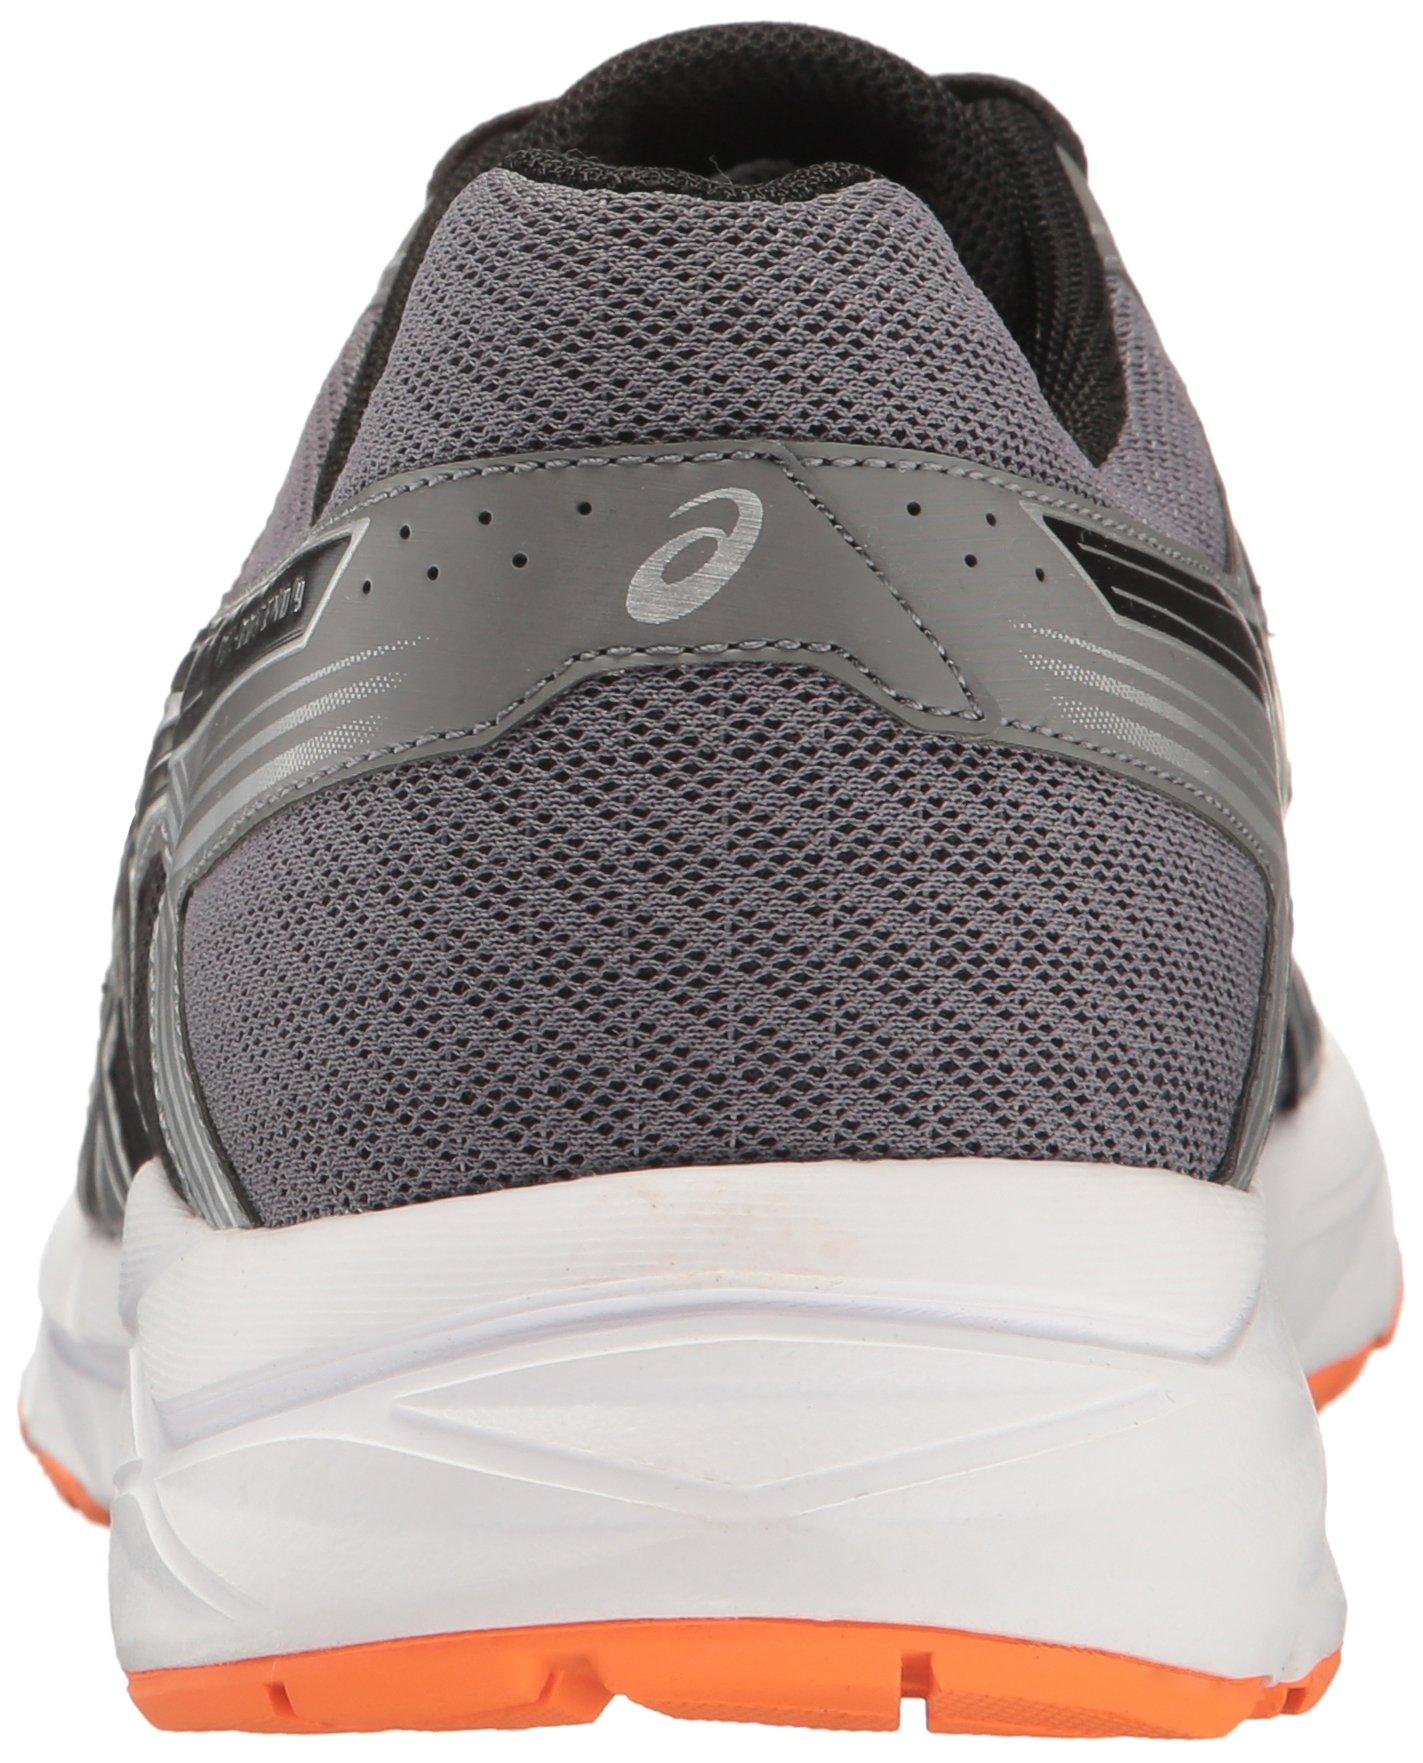 ASICS Men's Gel-Contend 4 Running Shoe, 13 UK